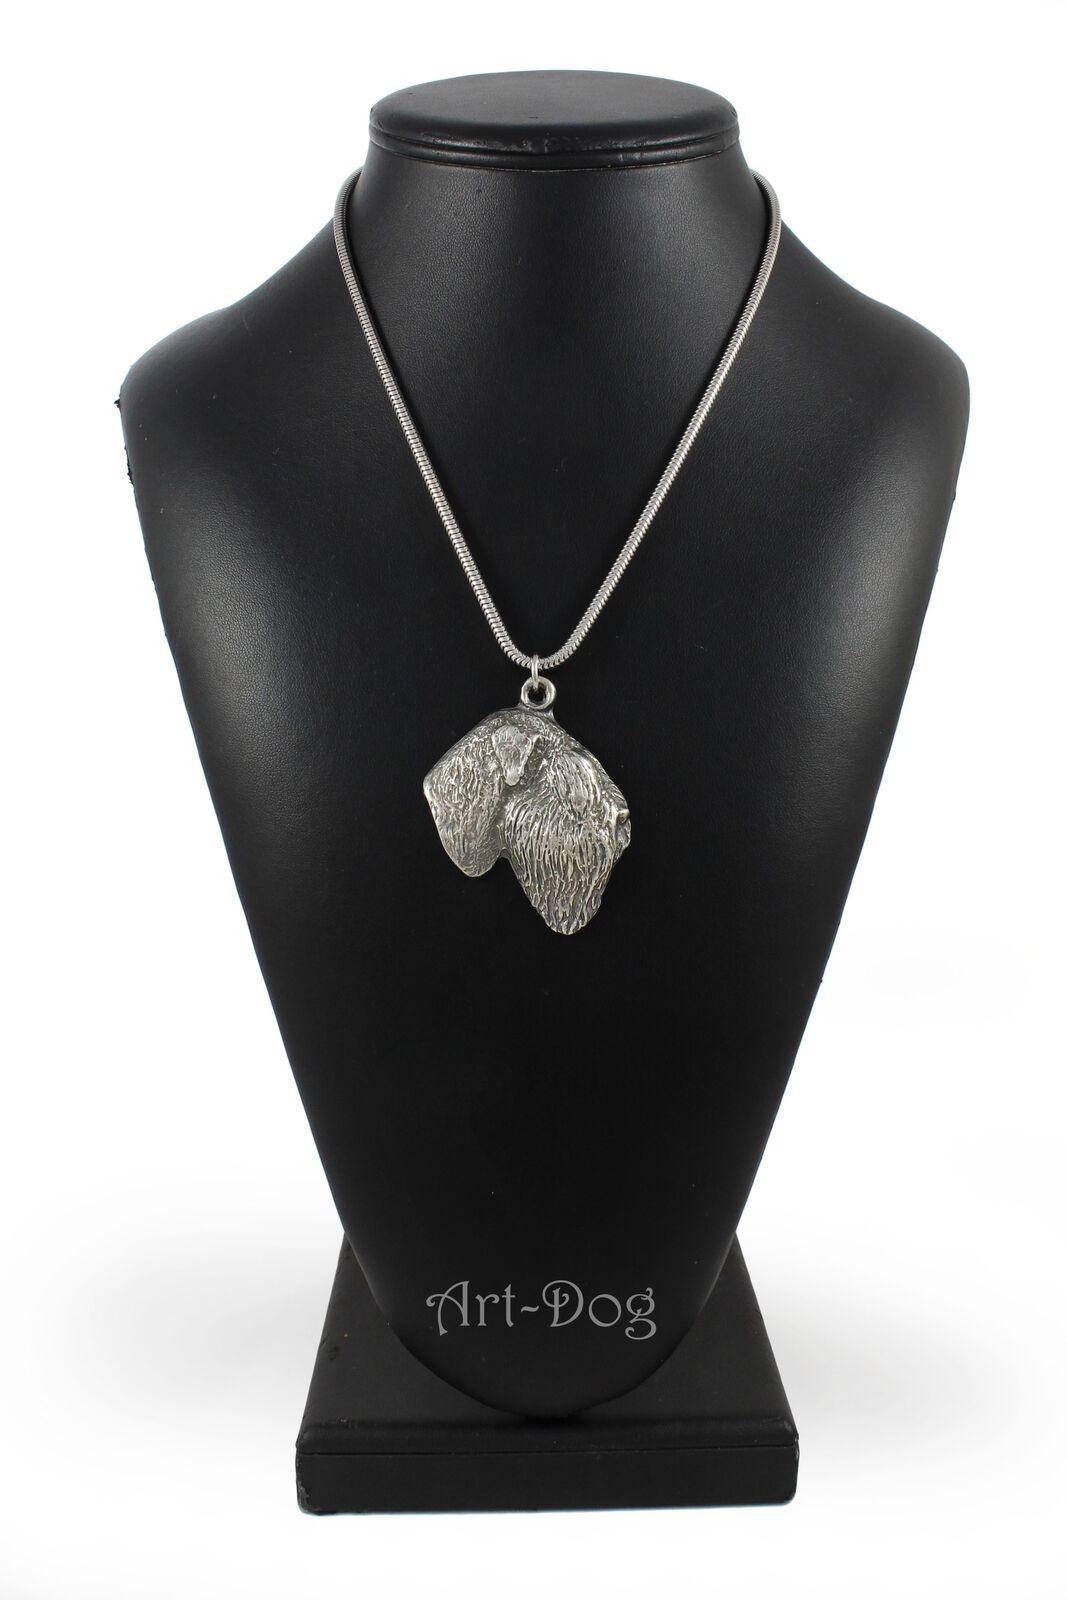 Terrier schwarz de Russie- Silber plaqué collier sur une cordon cordon cordon en Silber ArtDog FR 7afe41